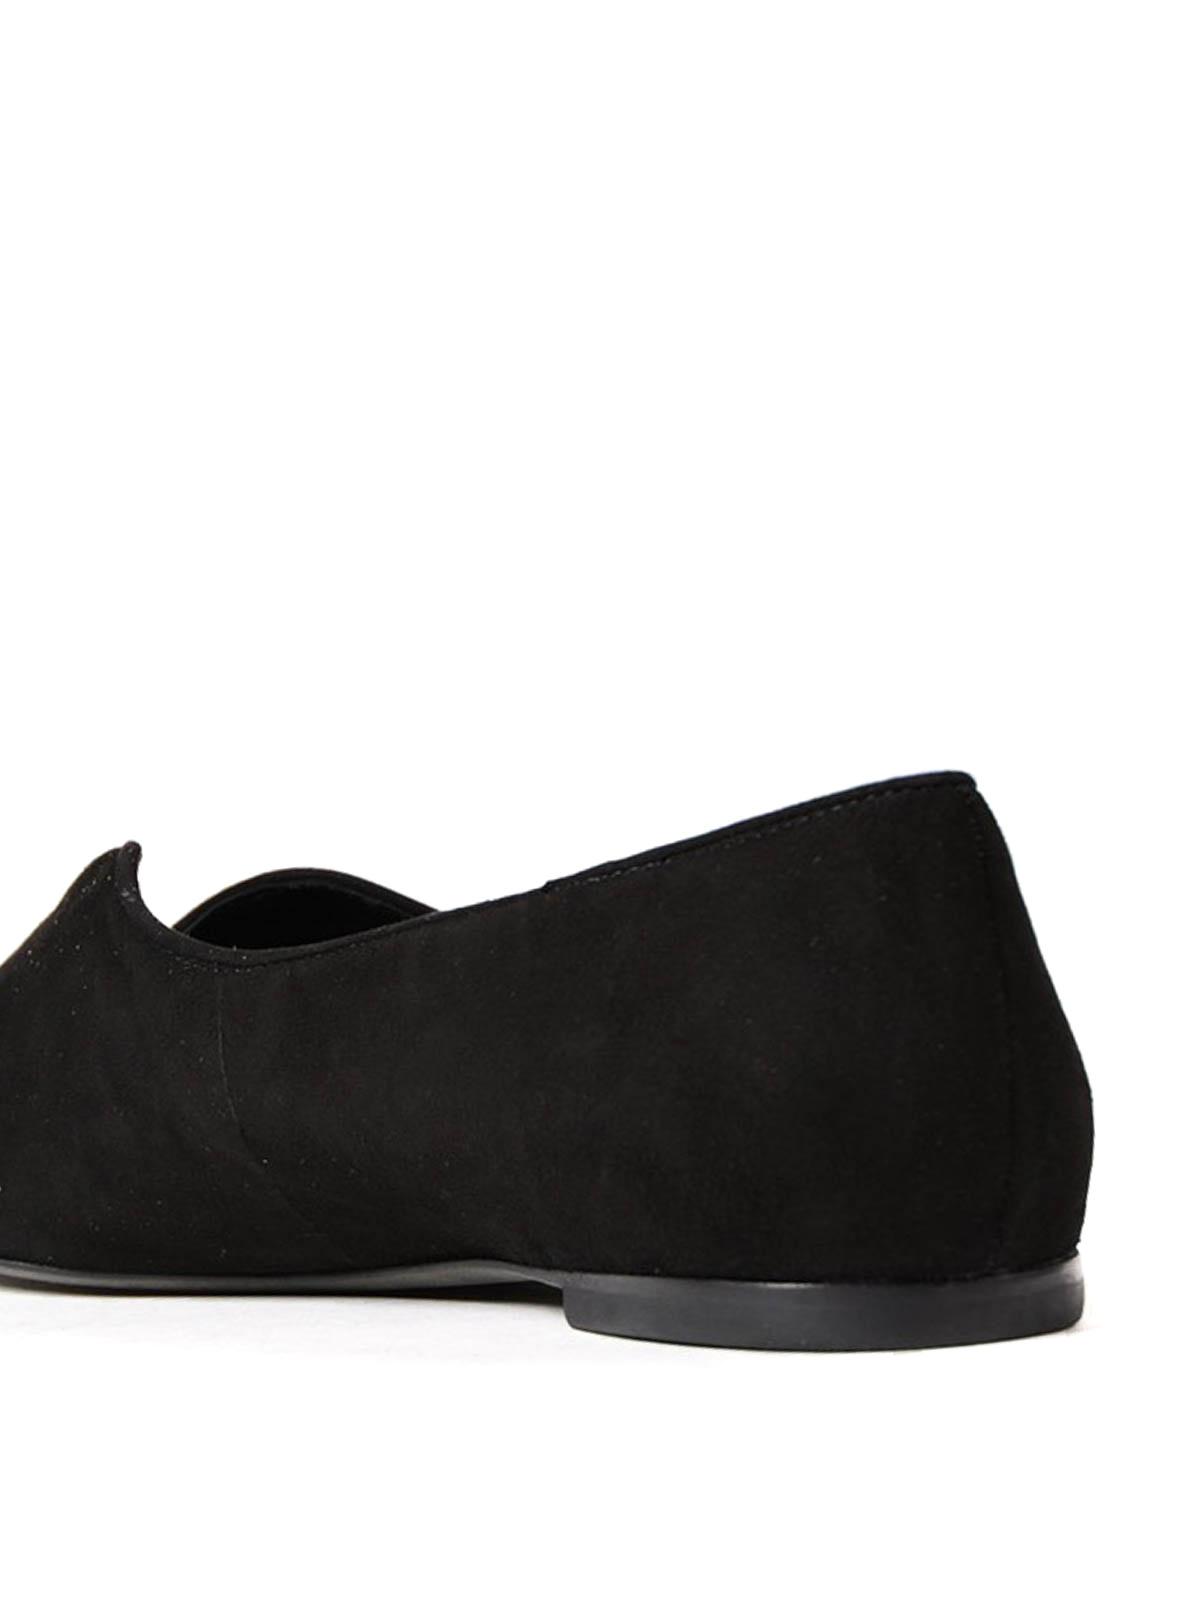 0459d4c0e0fdb3 Tory Burch - Lucia suede flats - flat shoes - 46815 009